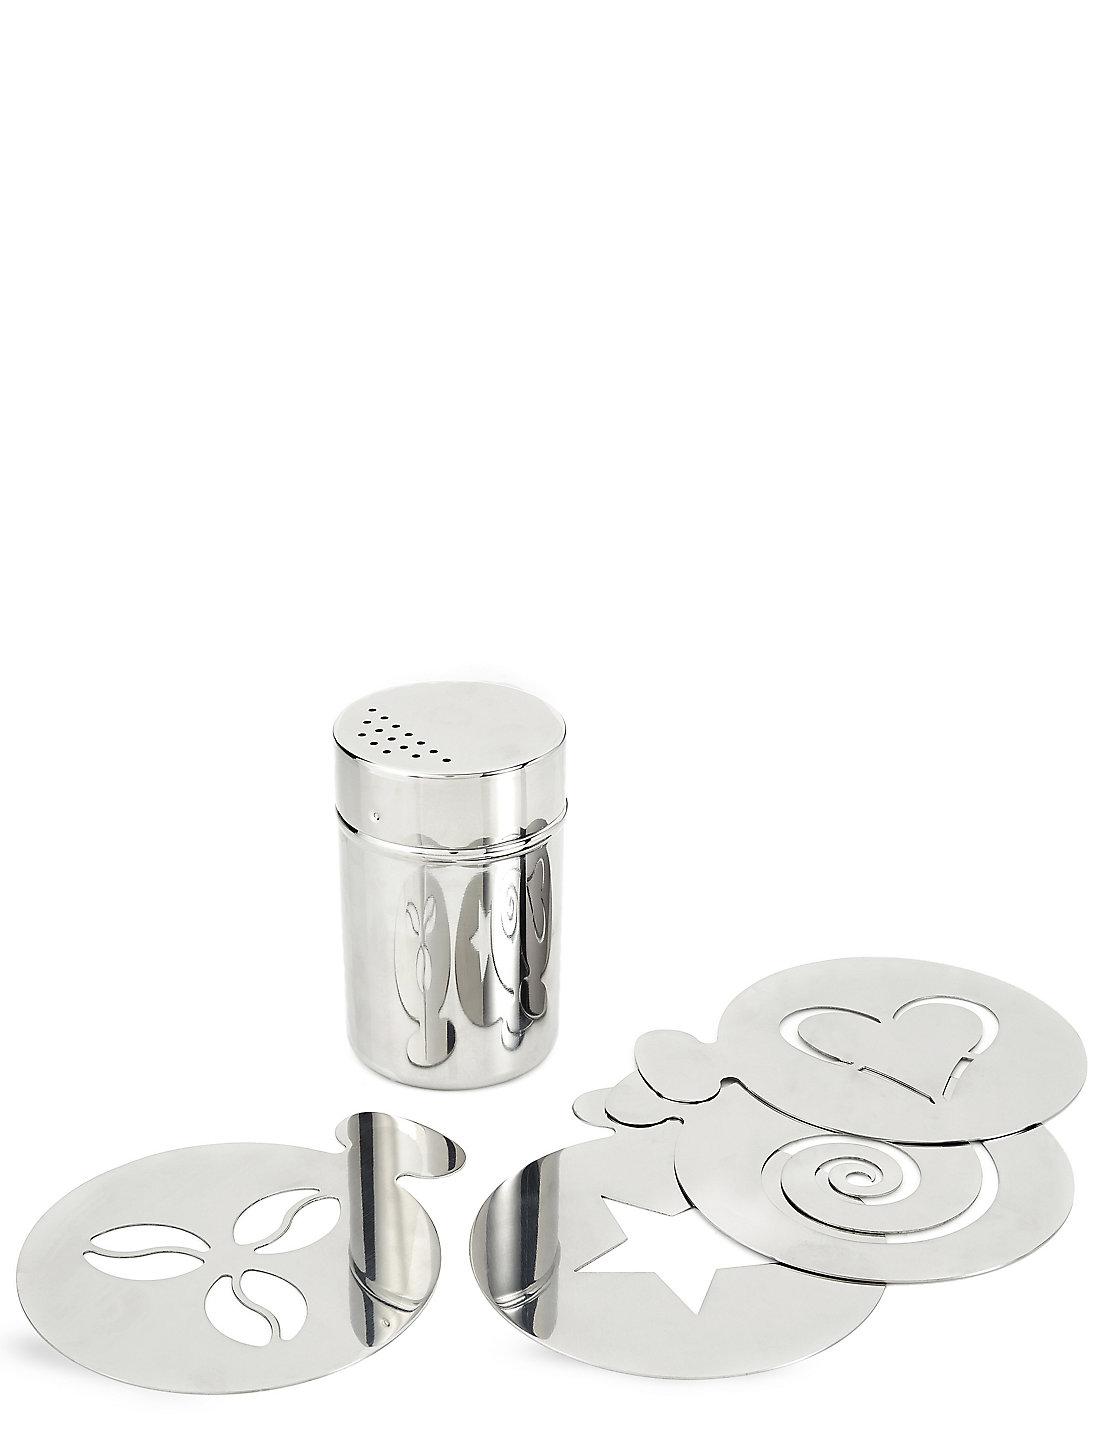 stainless steel shaker u0026 stencil gift set m u0026s